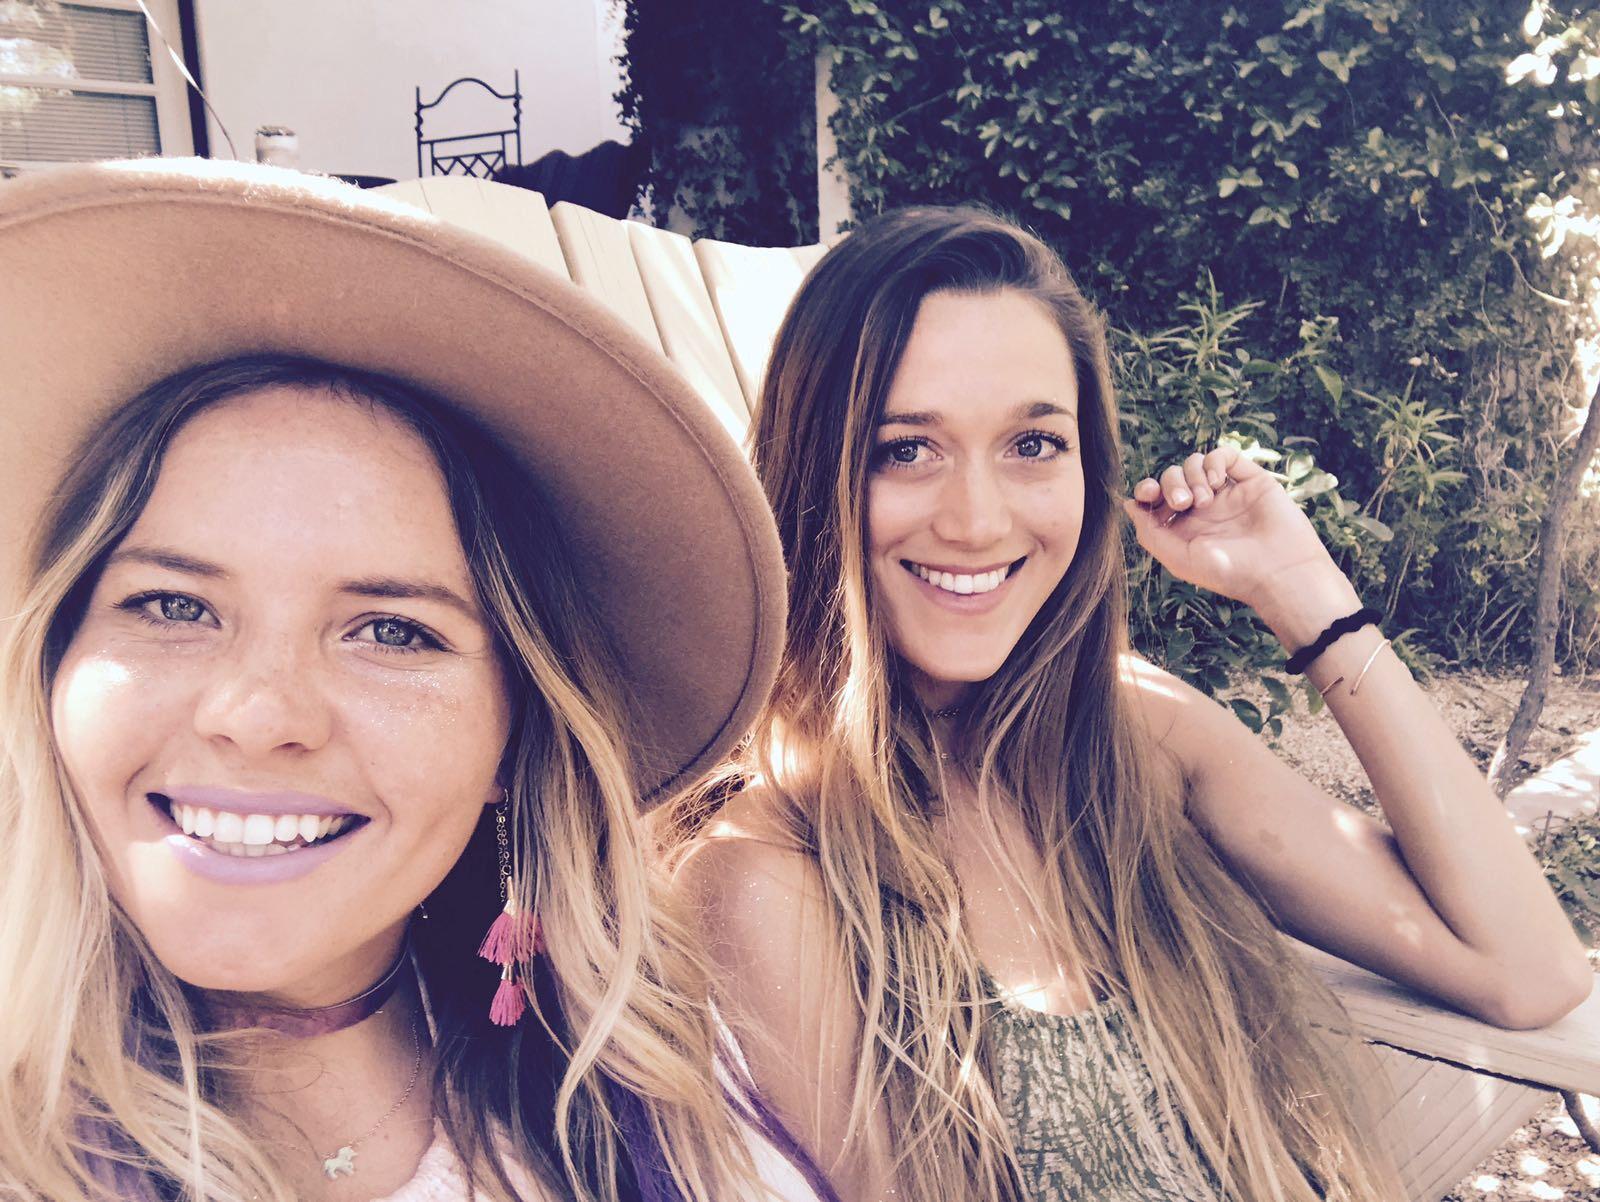 Kelia, Monyca and Bruna Share Their Top 5 Coachella Moments